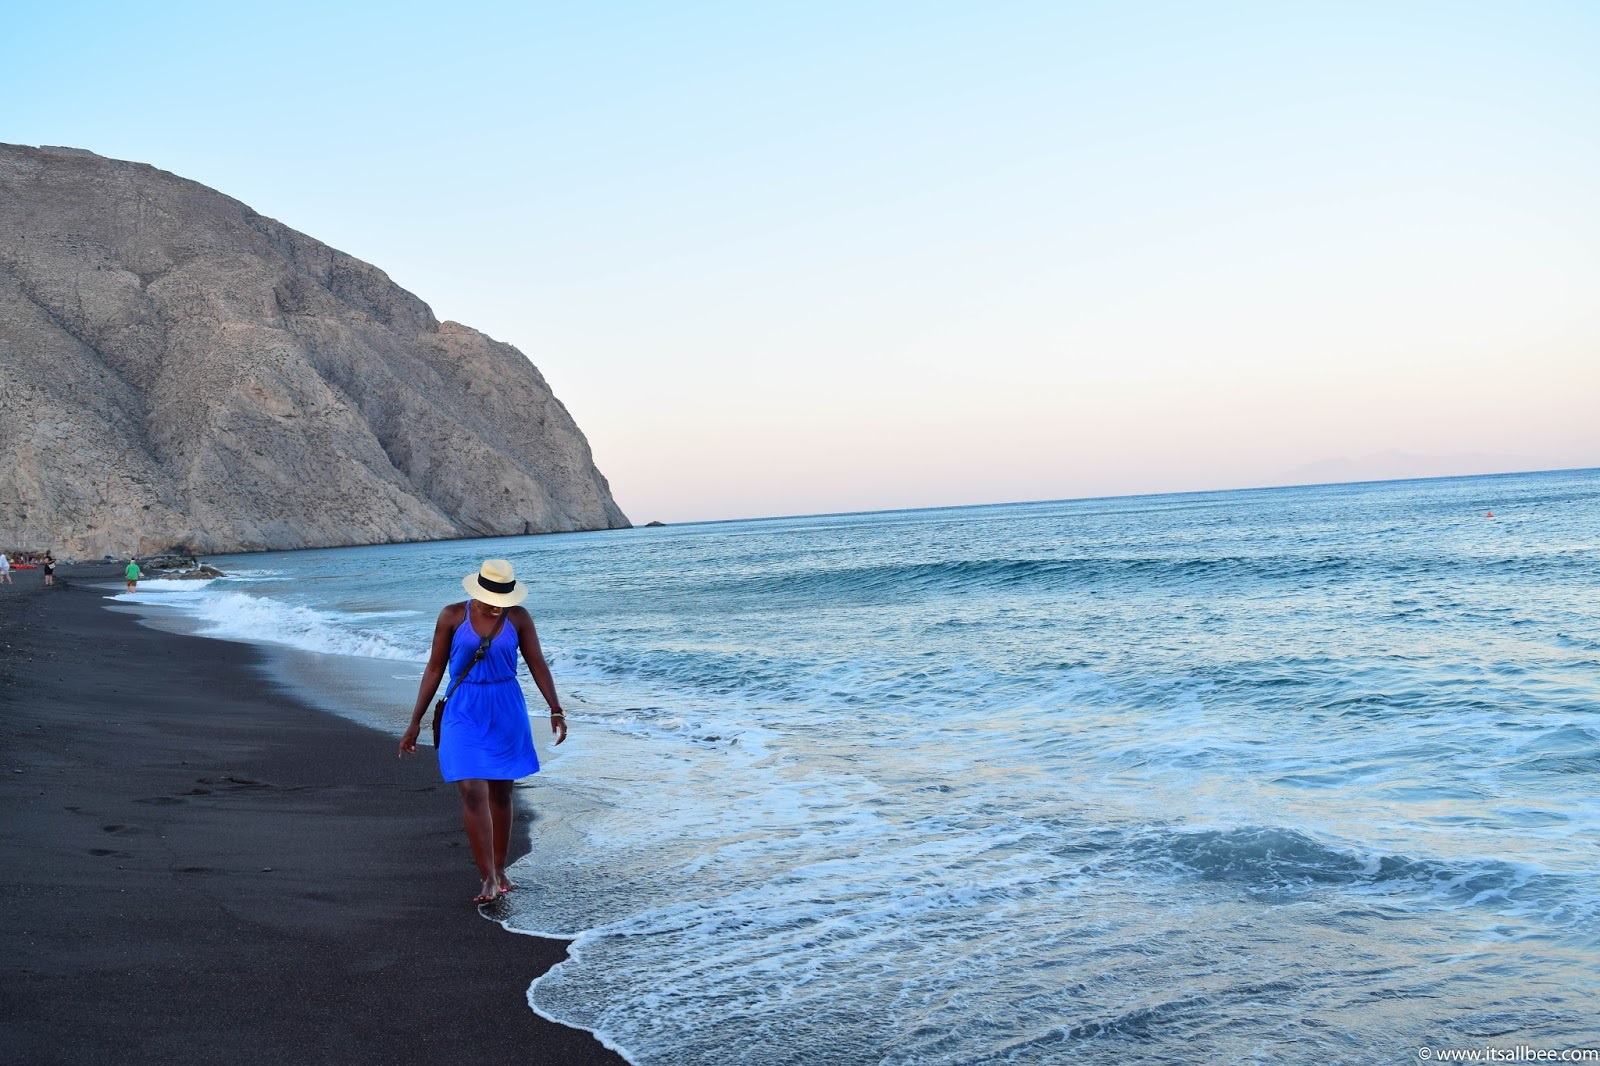 black beach santorini | Guide To The Best of Santorini Beaches